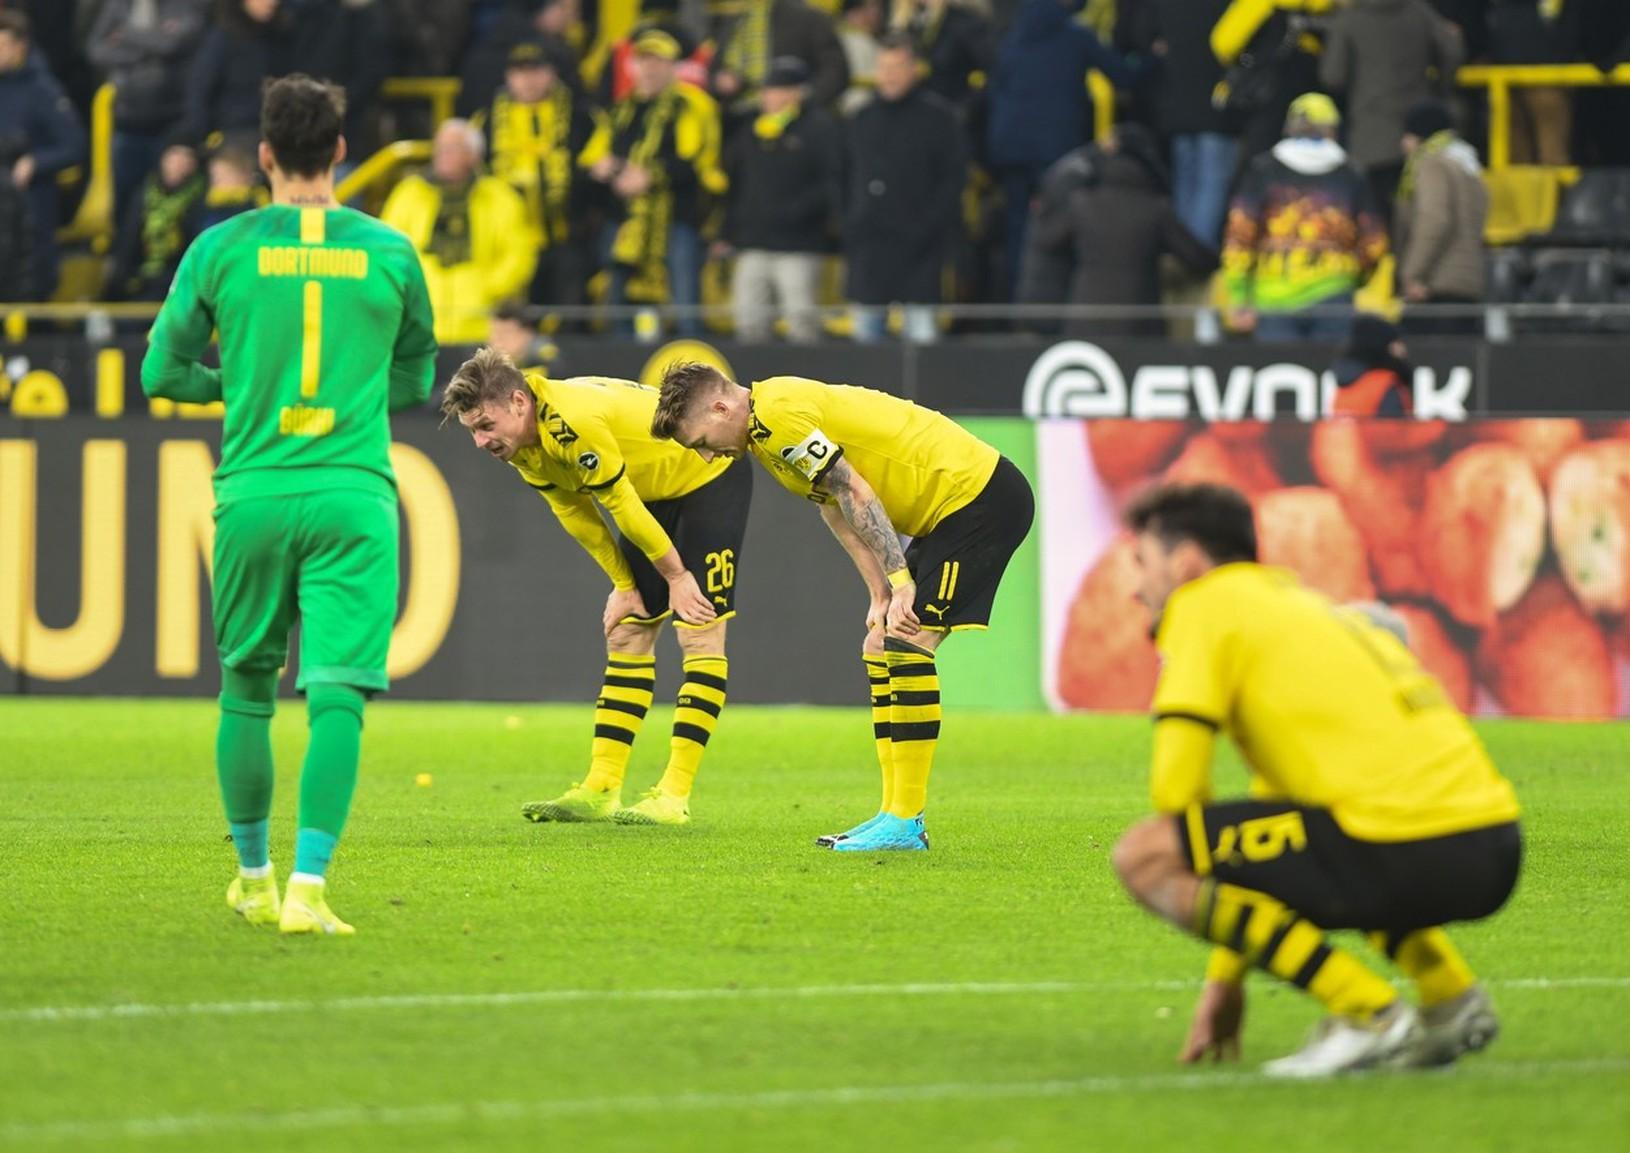 Borussia sklamala svojich fanúšikov